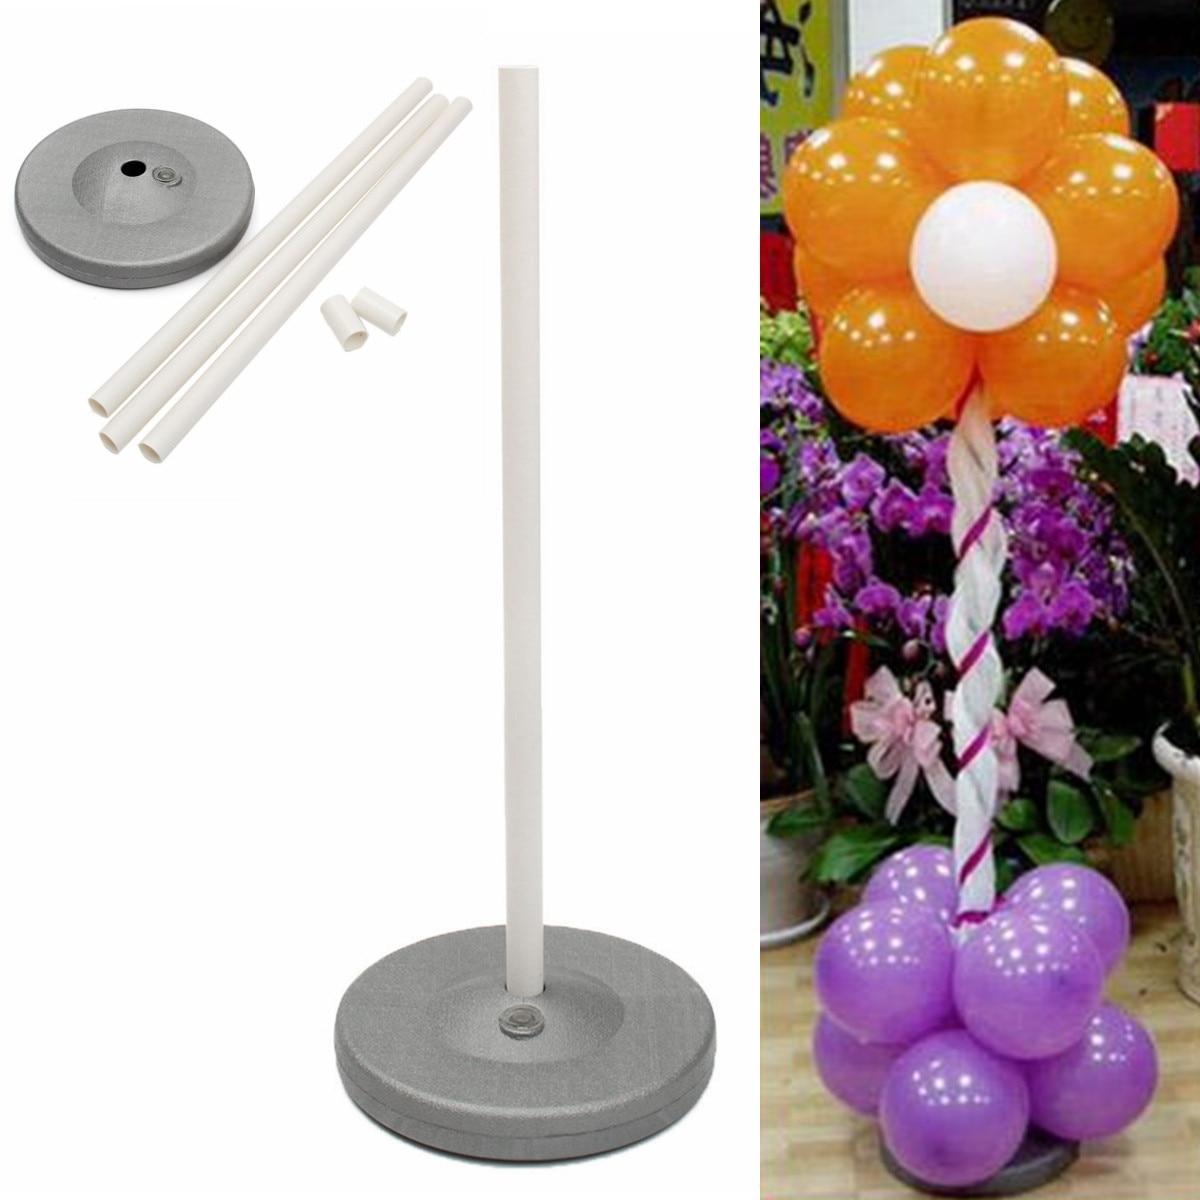 Diy balloon columns - Pvc Balloon Base Botton Column Birthday Party Base Stand Stick Display Diy Pole Event Supplies Wedding